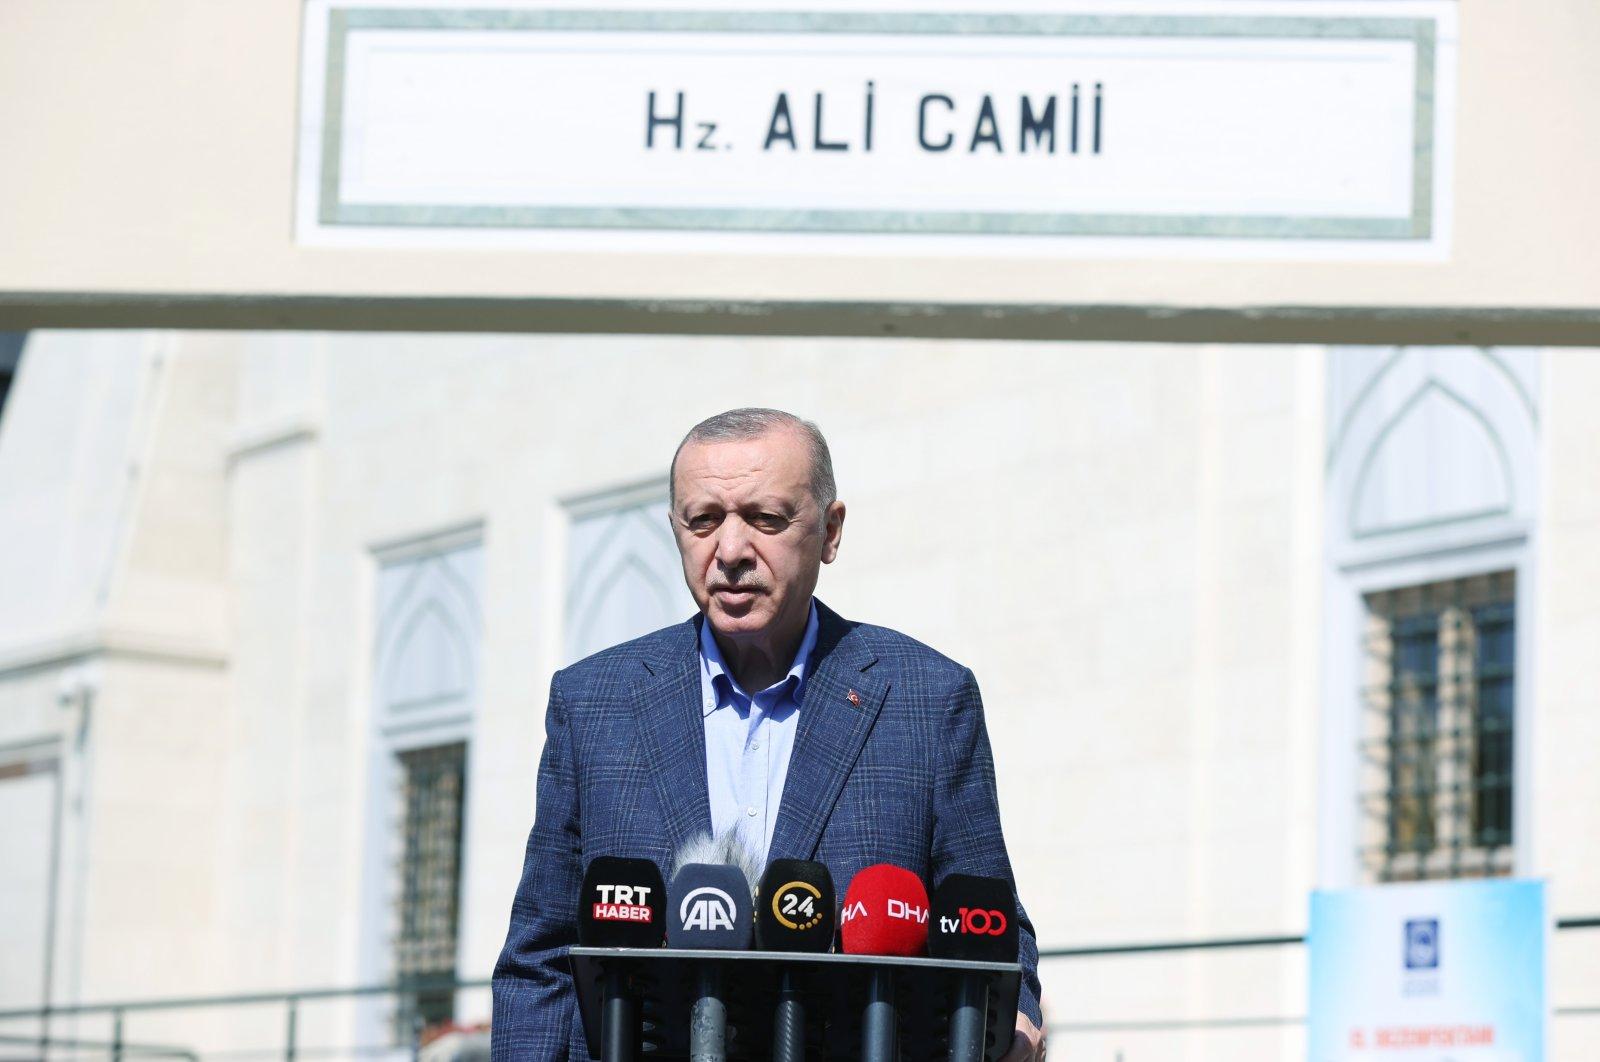 President Recep Tayyip Erdoğan addresses reporters after Friday prayers in Istanbul, Turkey, Sept. 24, 2021. (İHA Photo)